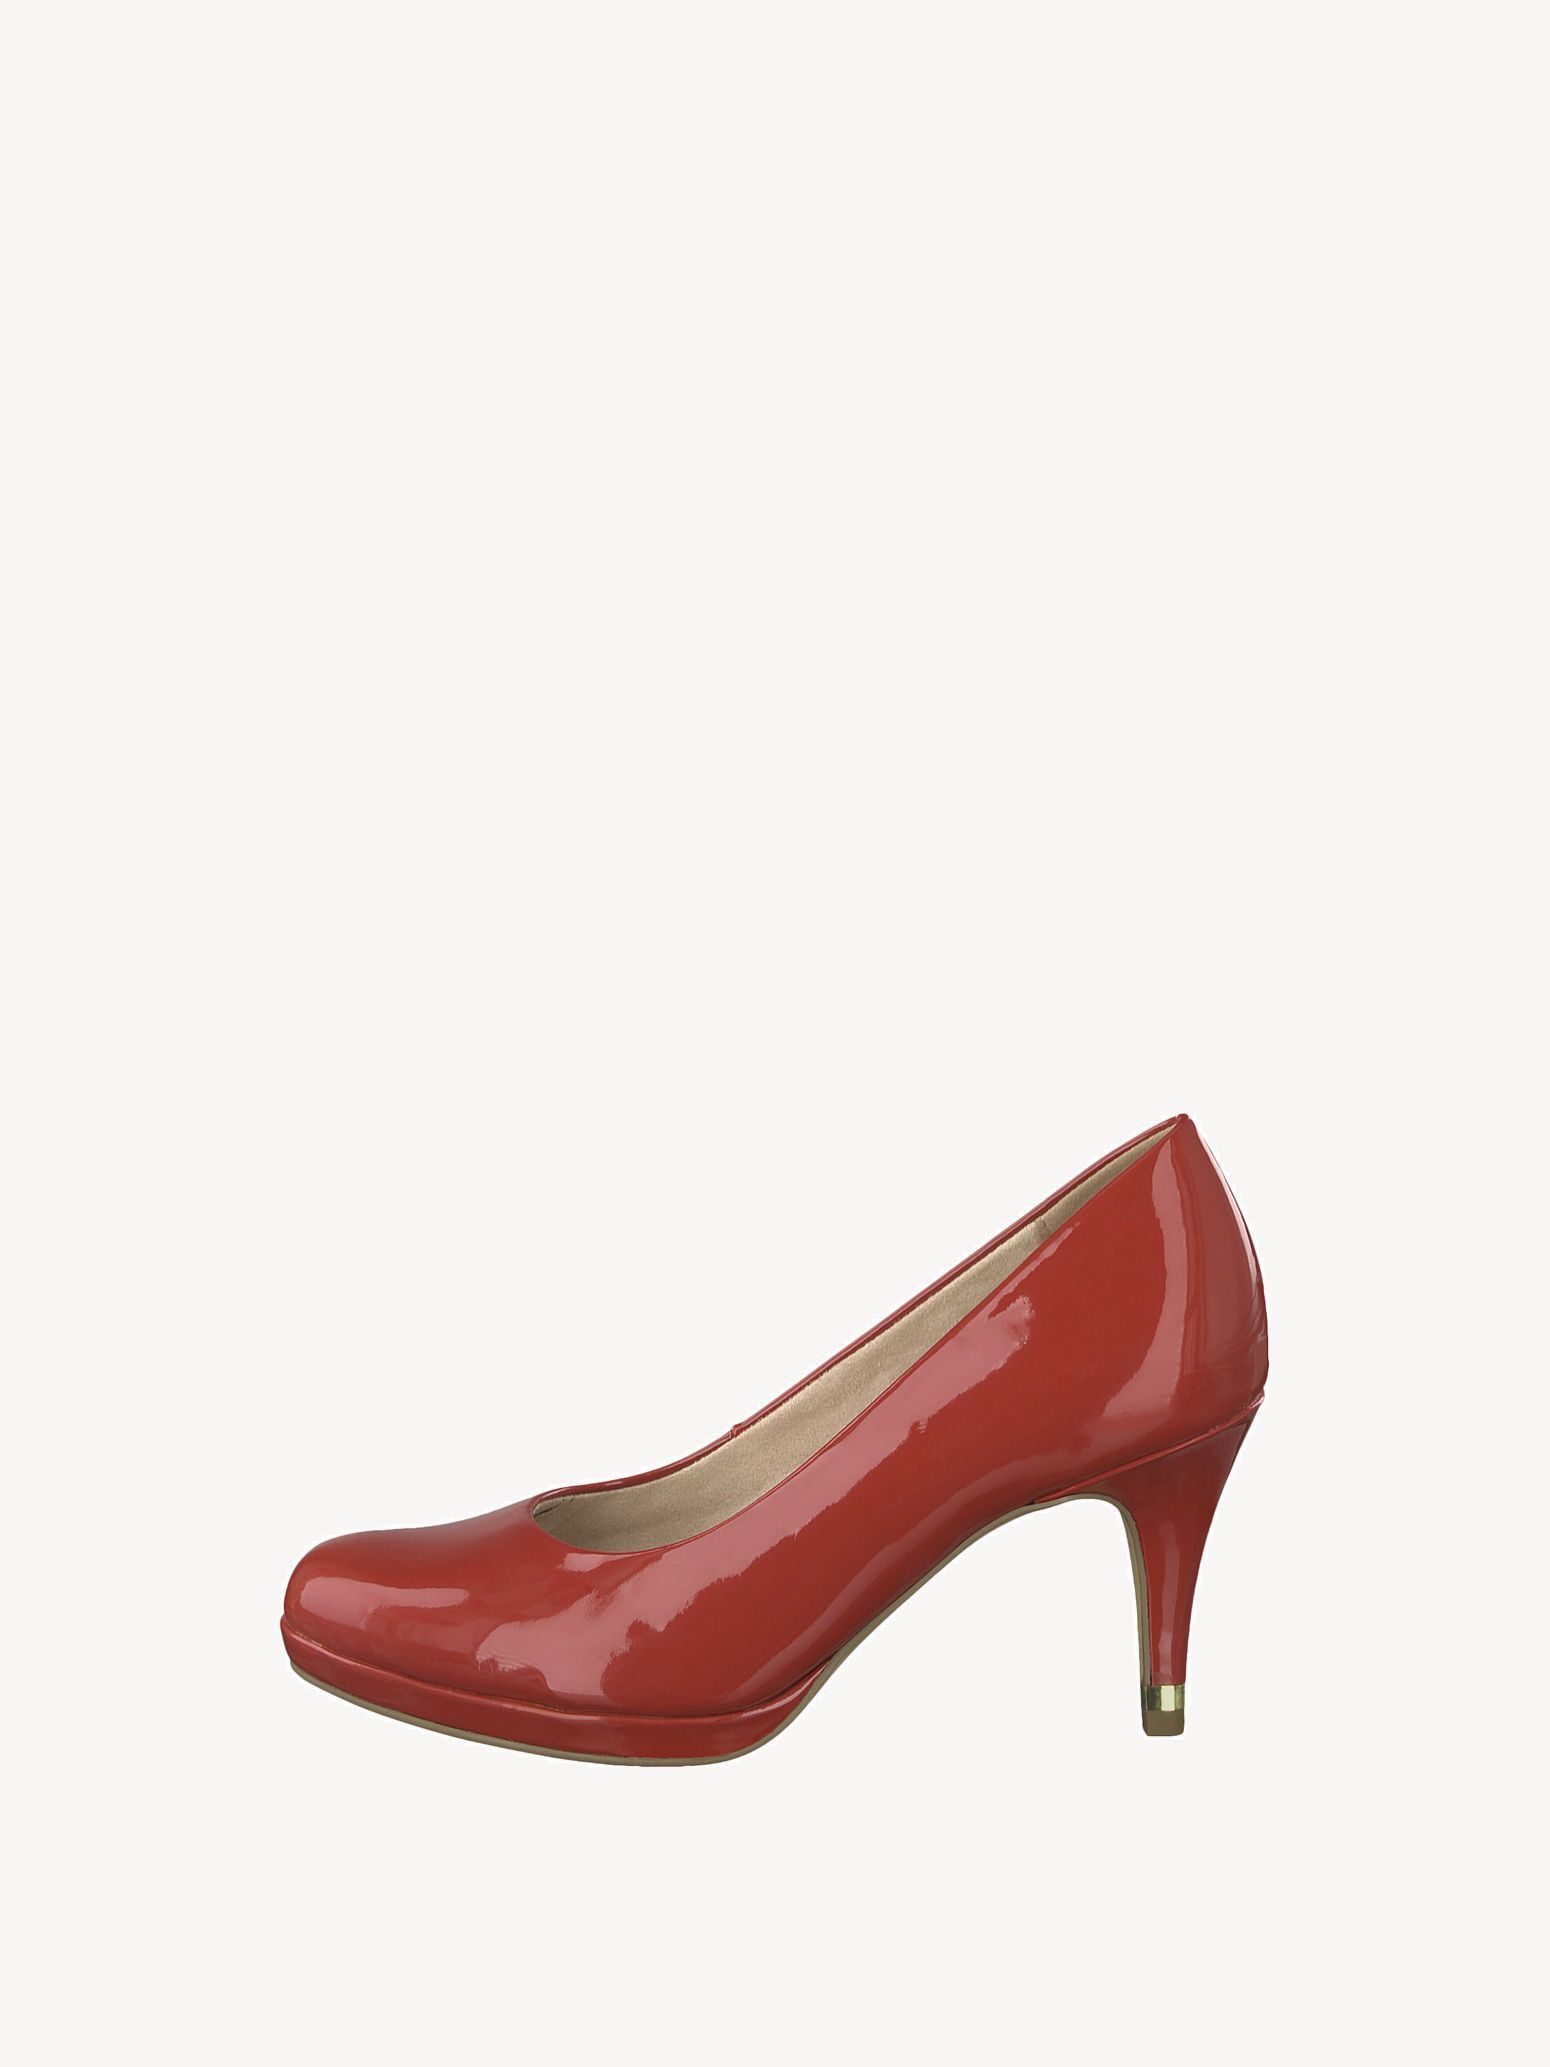 Chaussures Escarpins Tamaris Escarpins Escarpins Femmes Chaussures Tamaris Femmes Tamaris n0XwZOPNk8